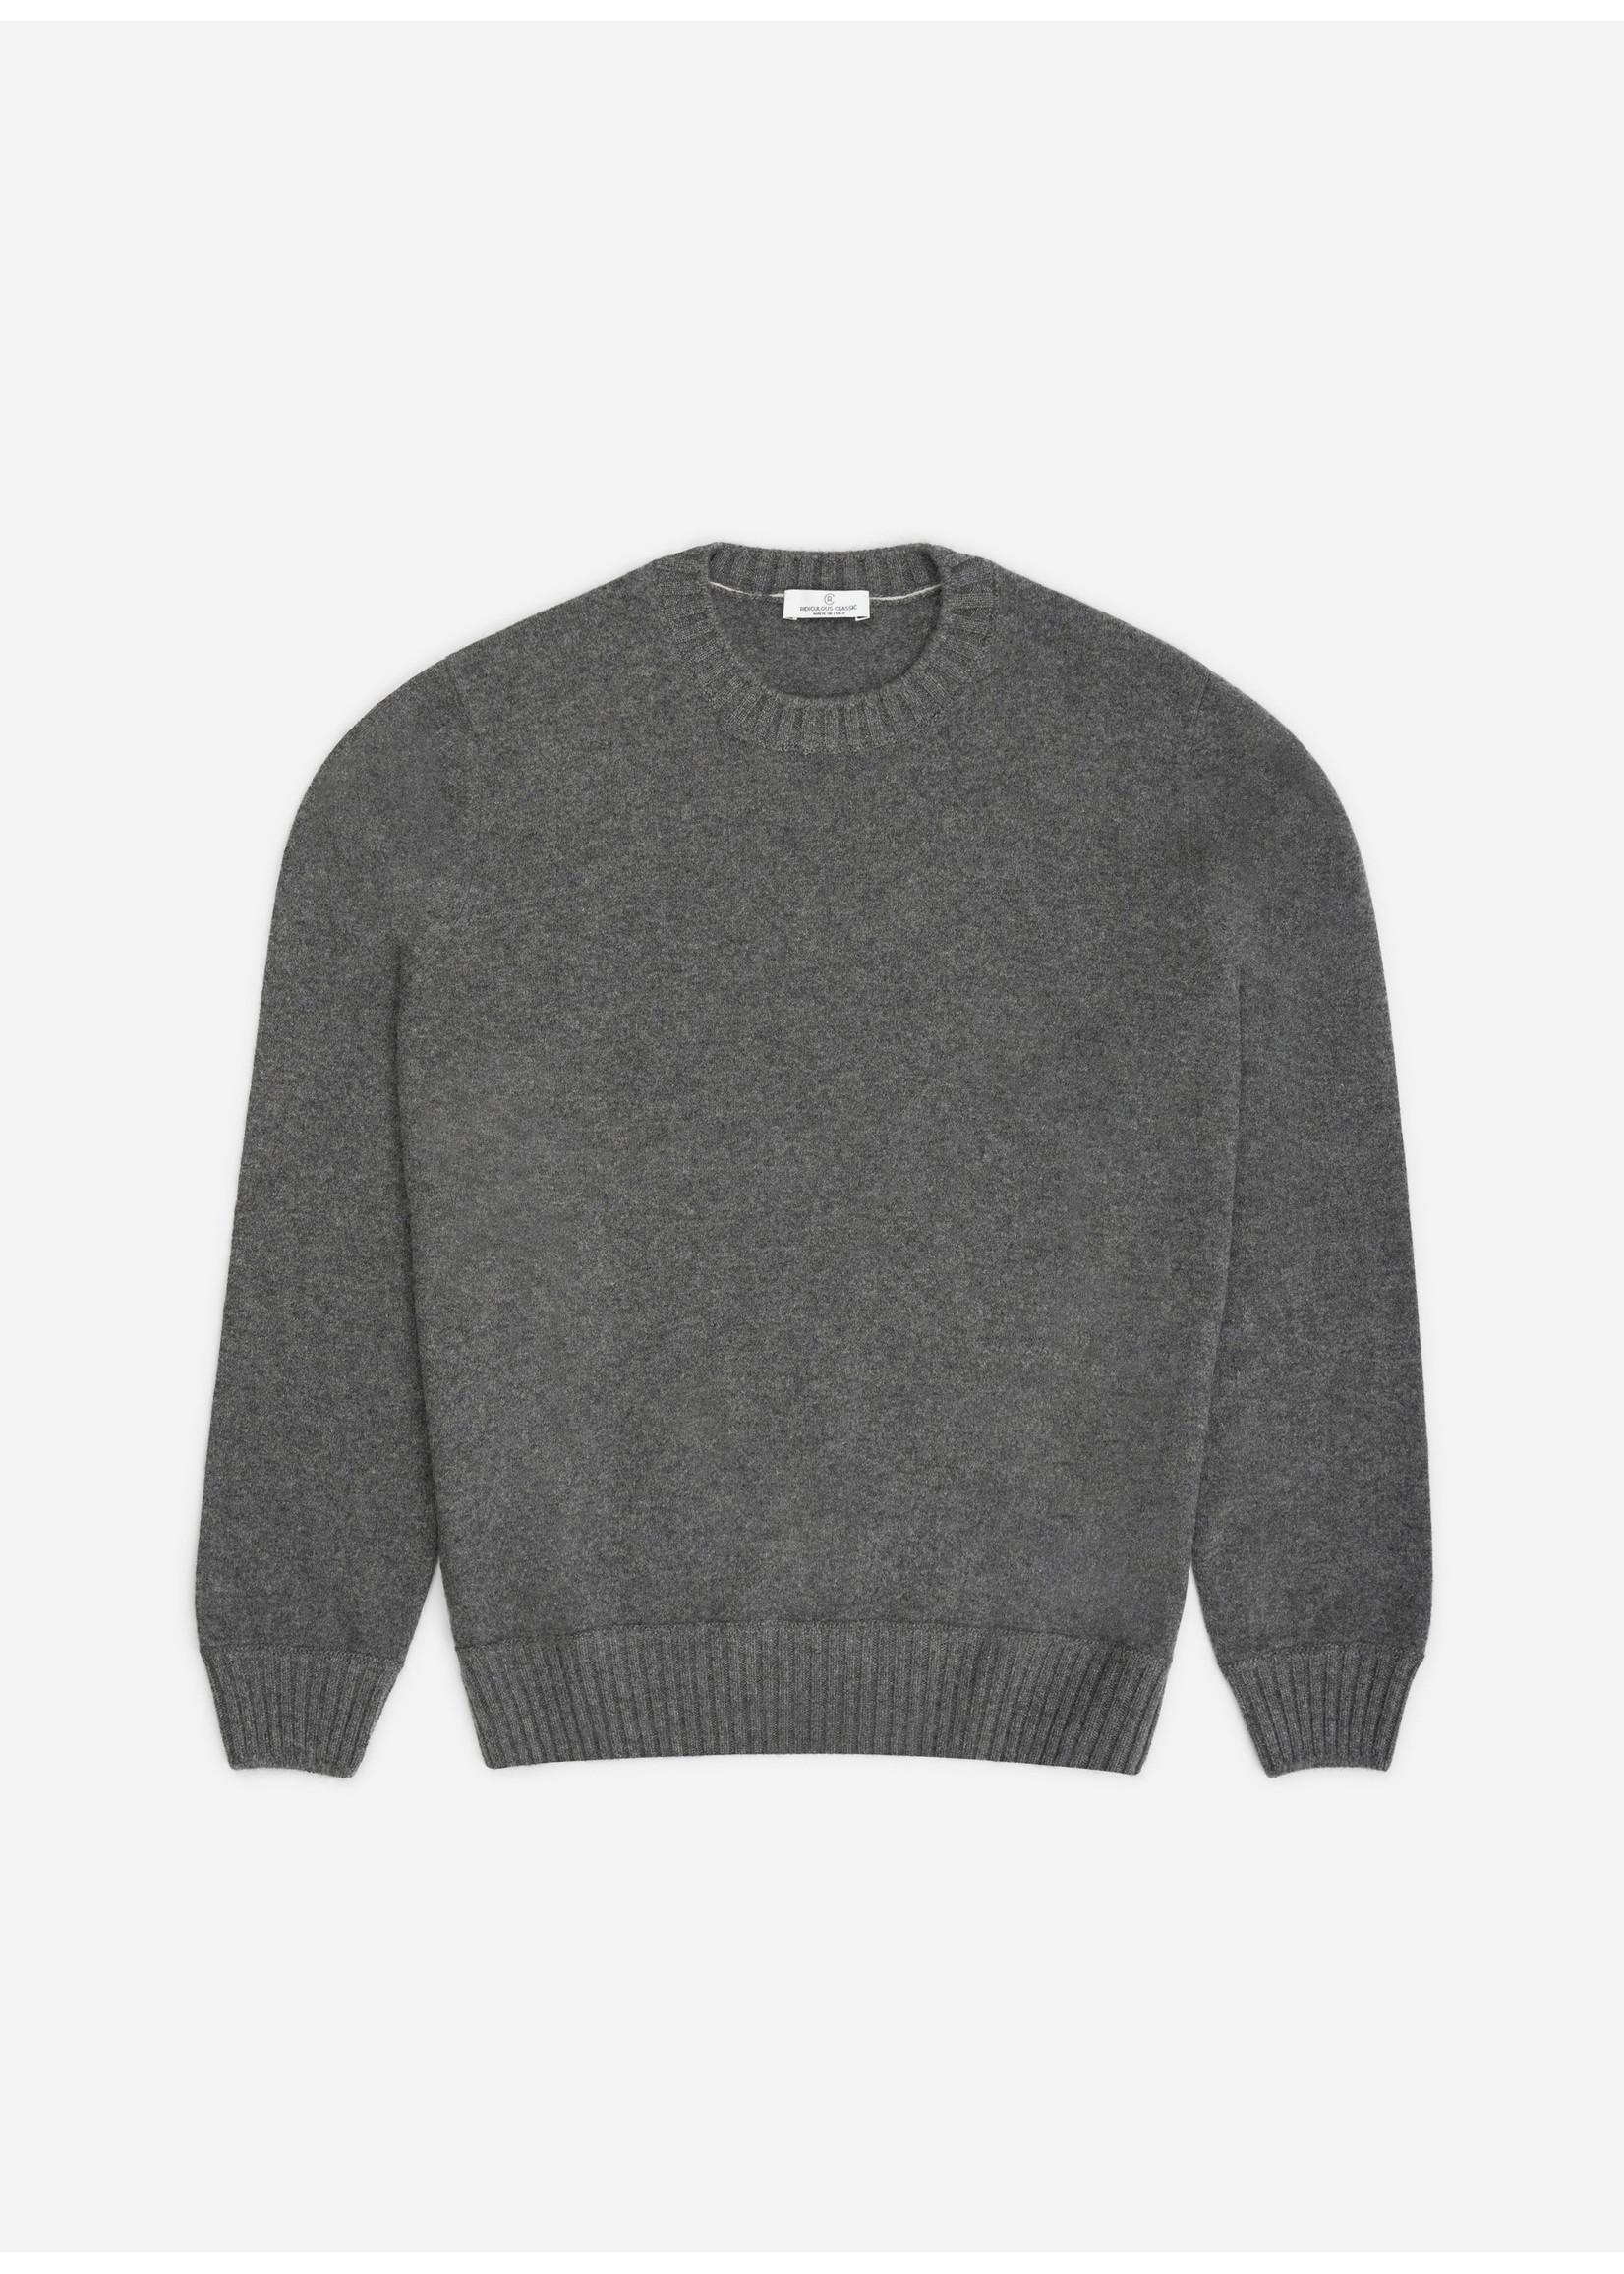 Ridiculous Classic Cashmere Pull Dark Grey